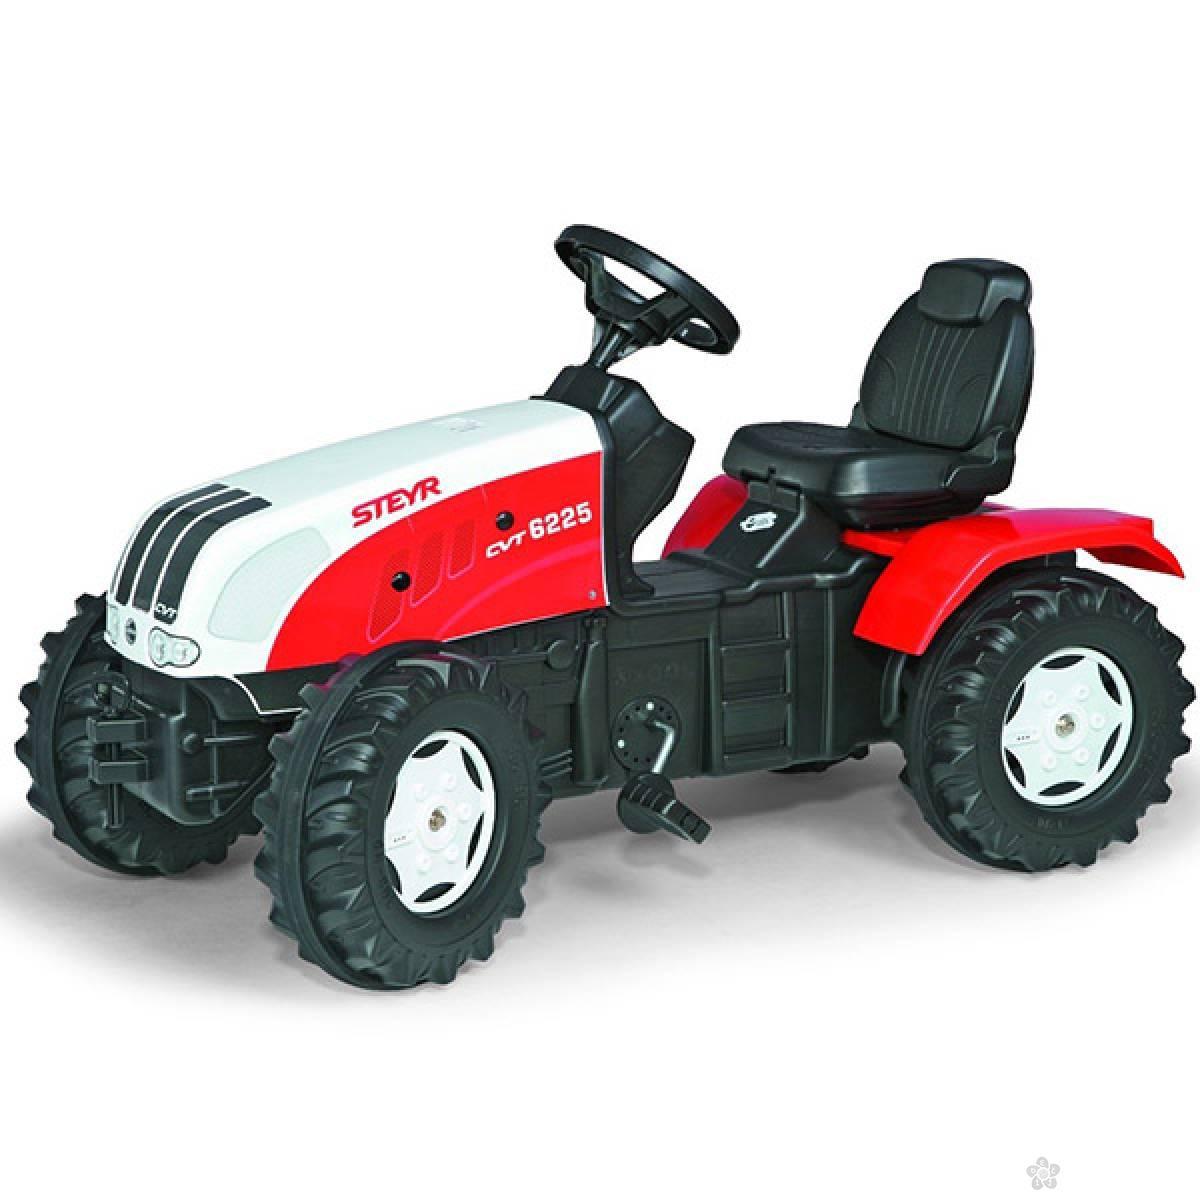 Traktor na pedale Rolly Steyr CVT 6240 035304